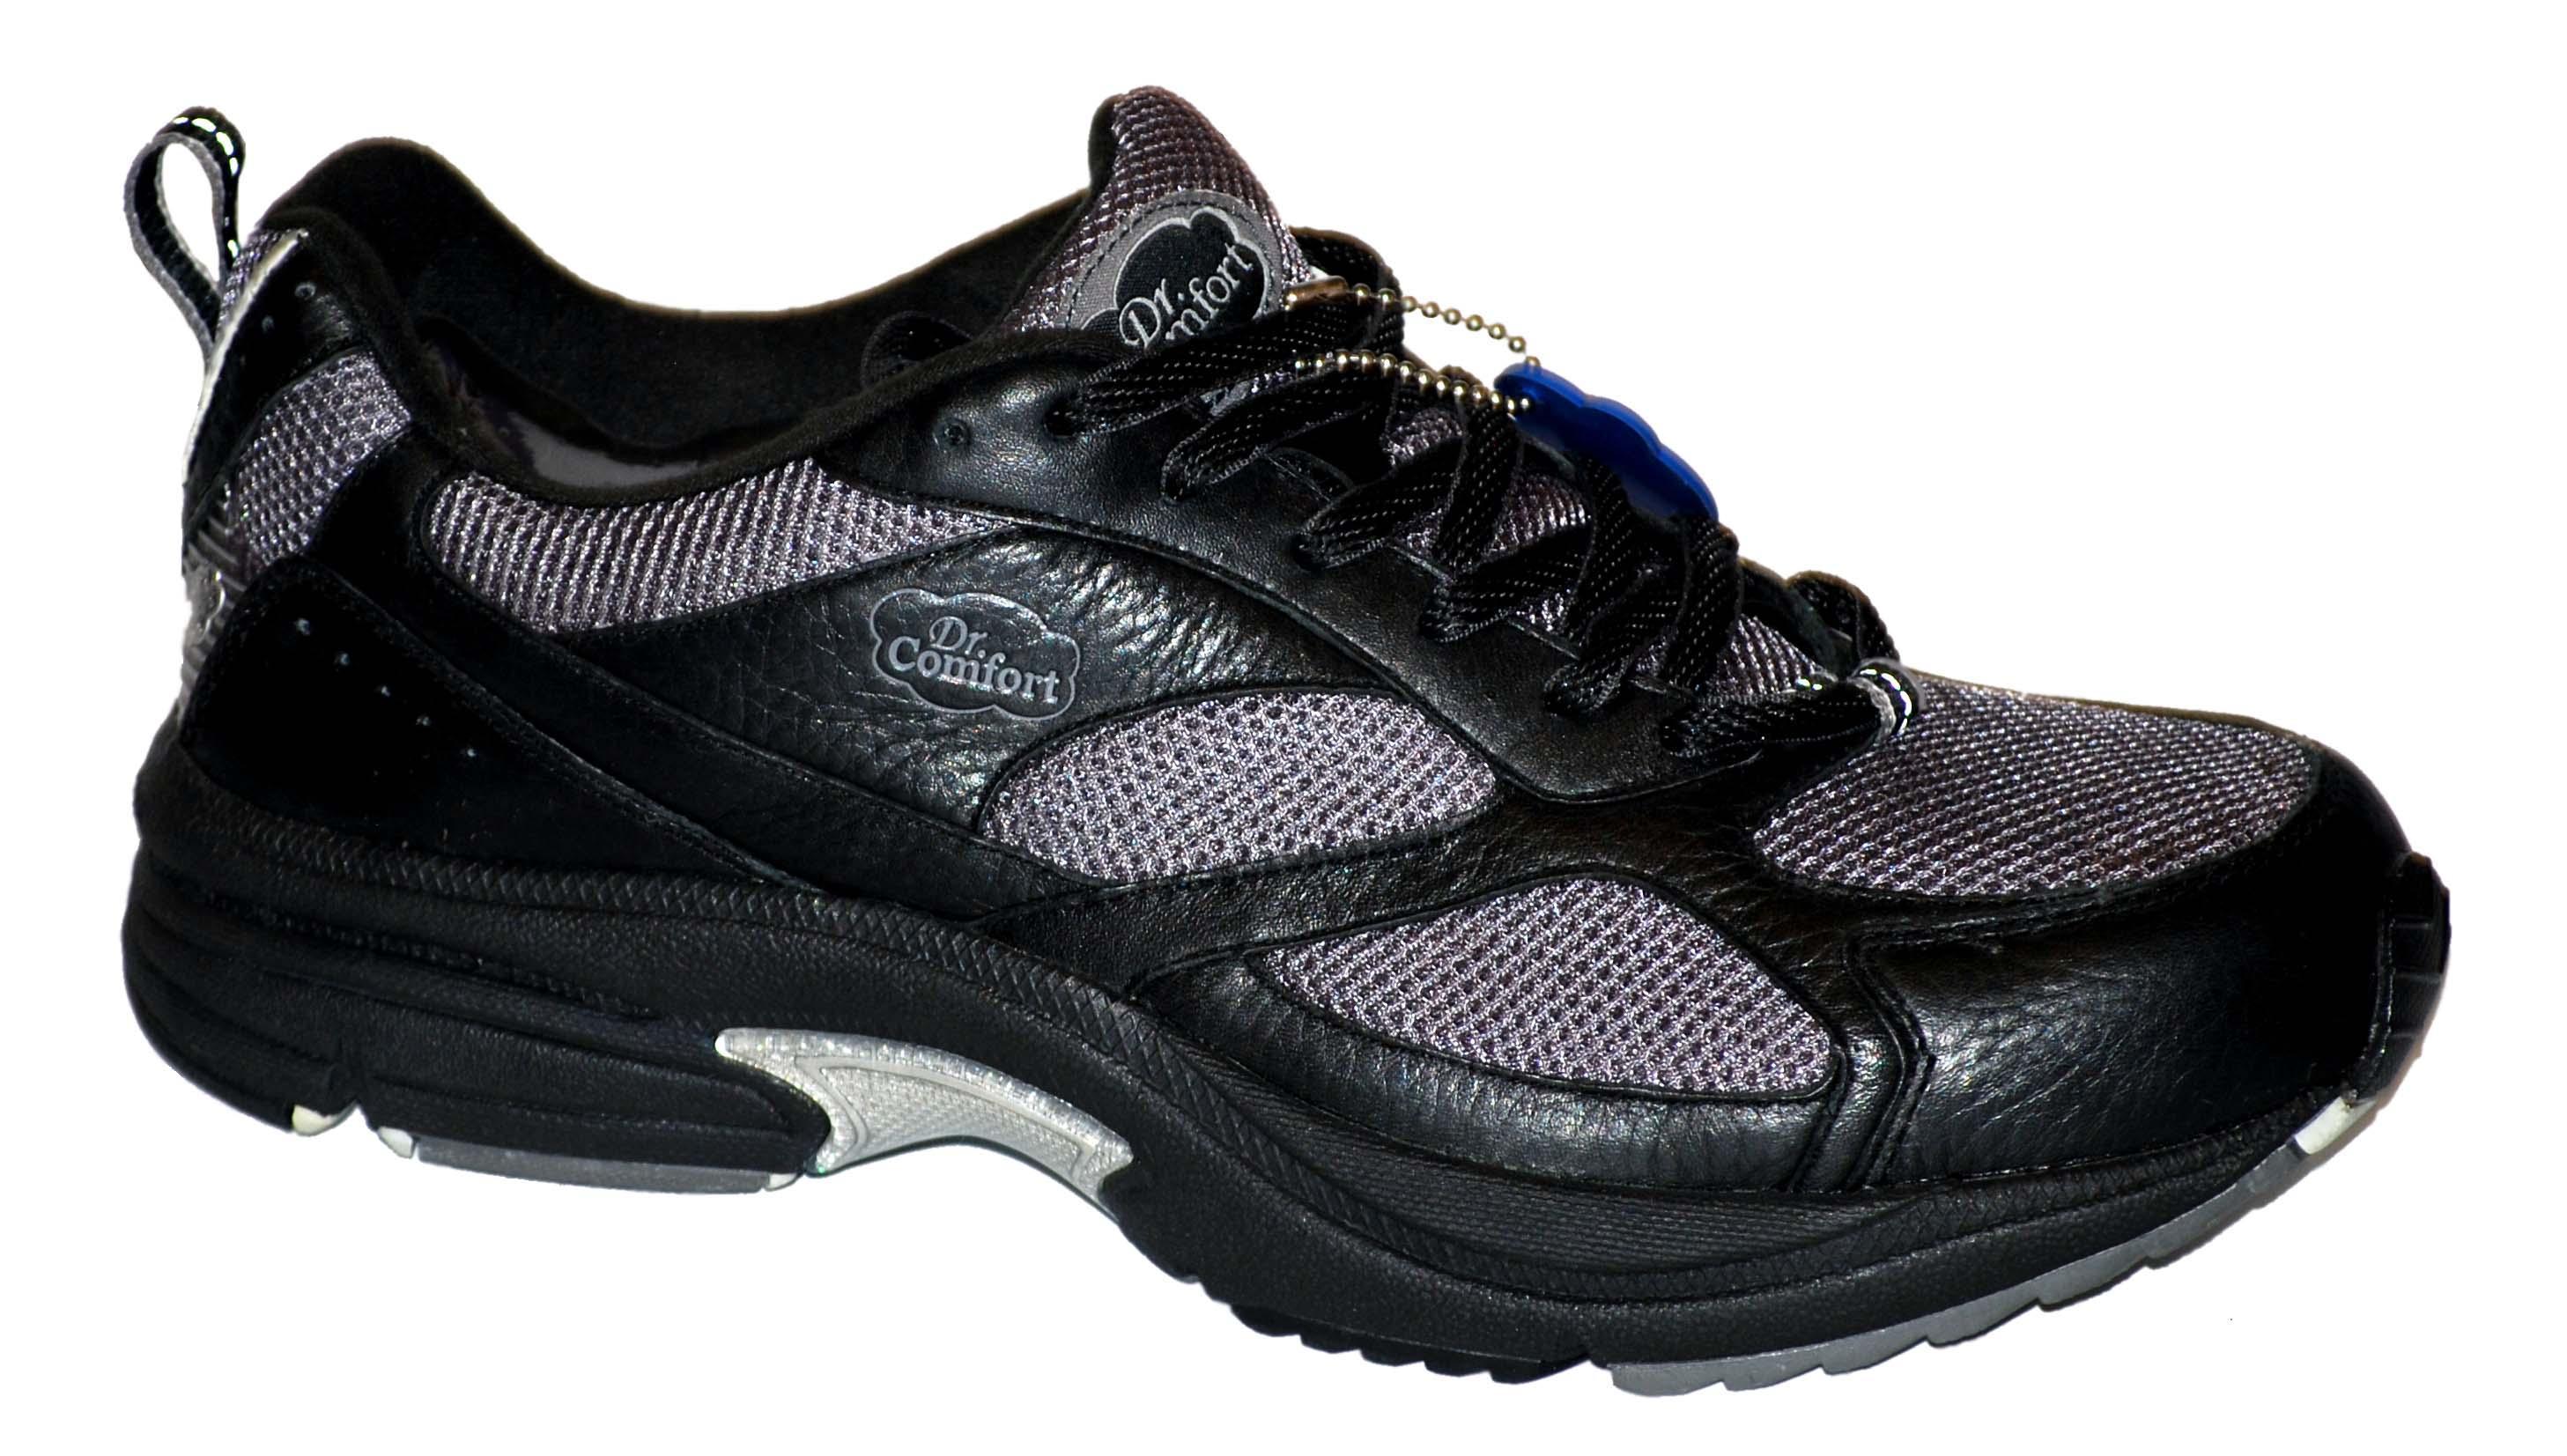 women traveltime and wedges easy spirit comfort comforter for mediana originator pz shoes doctor of the casual antigravity pg comfortable esmediana